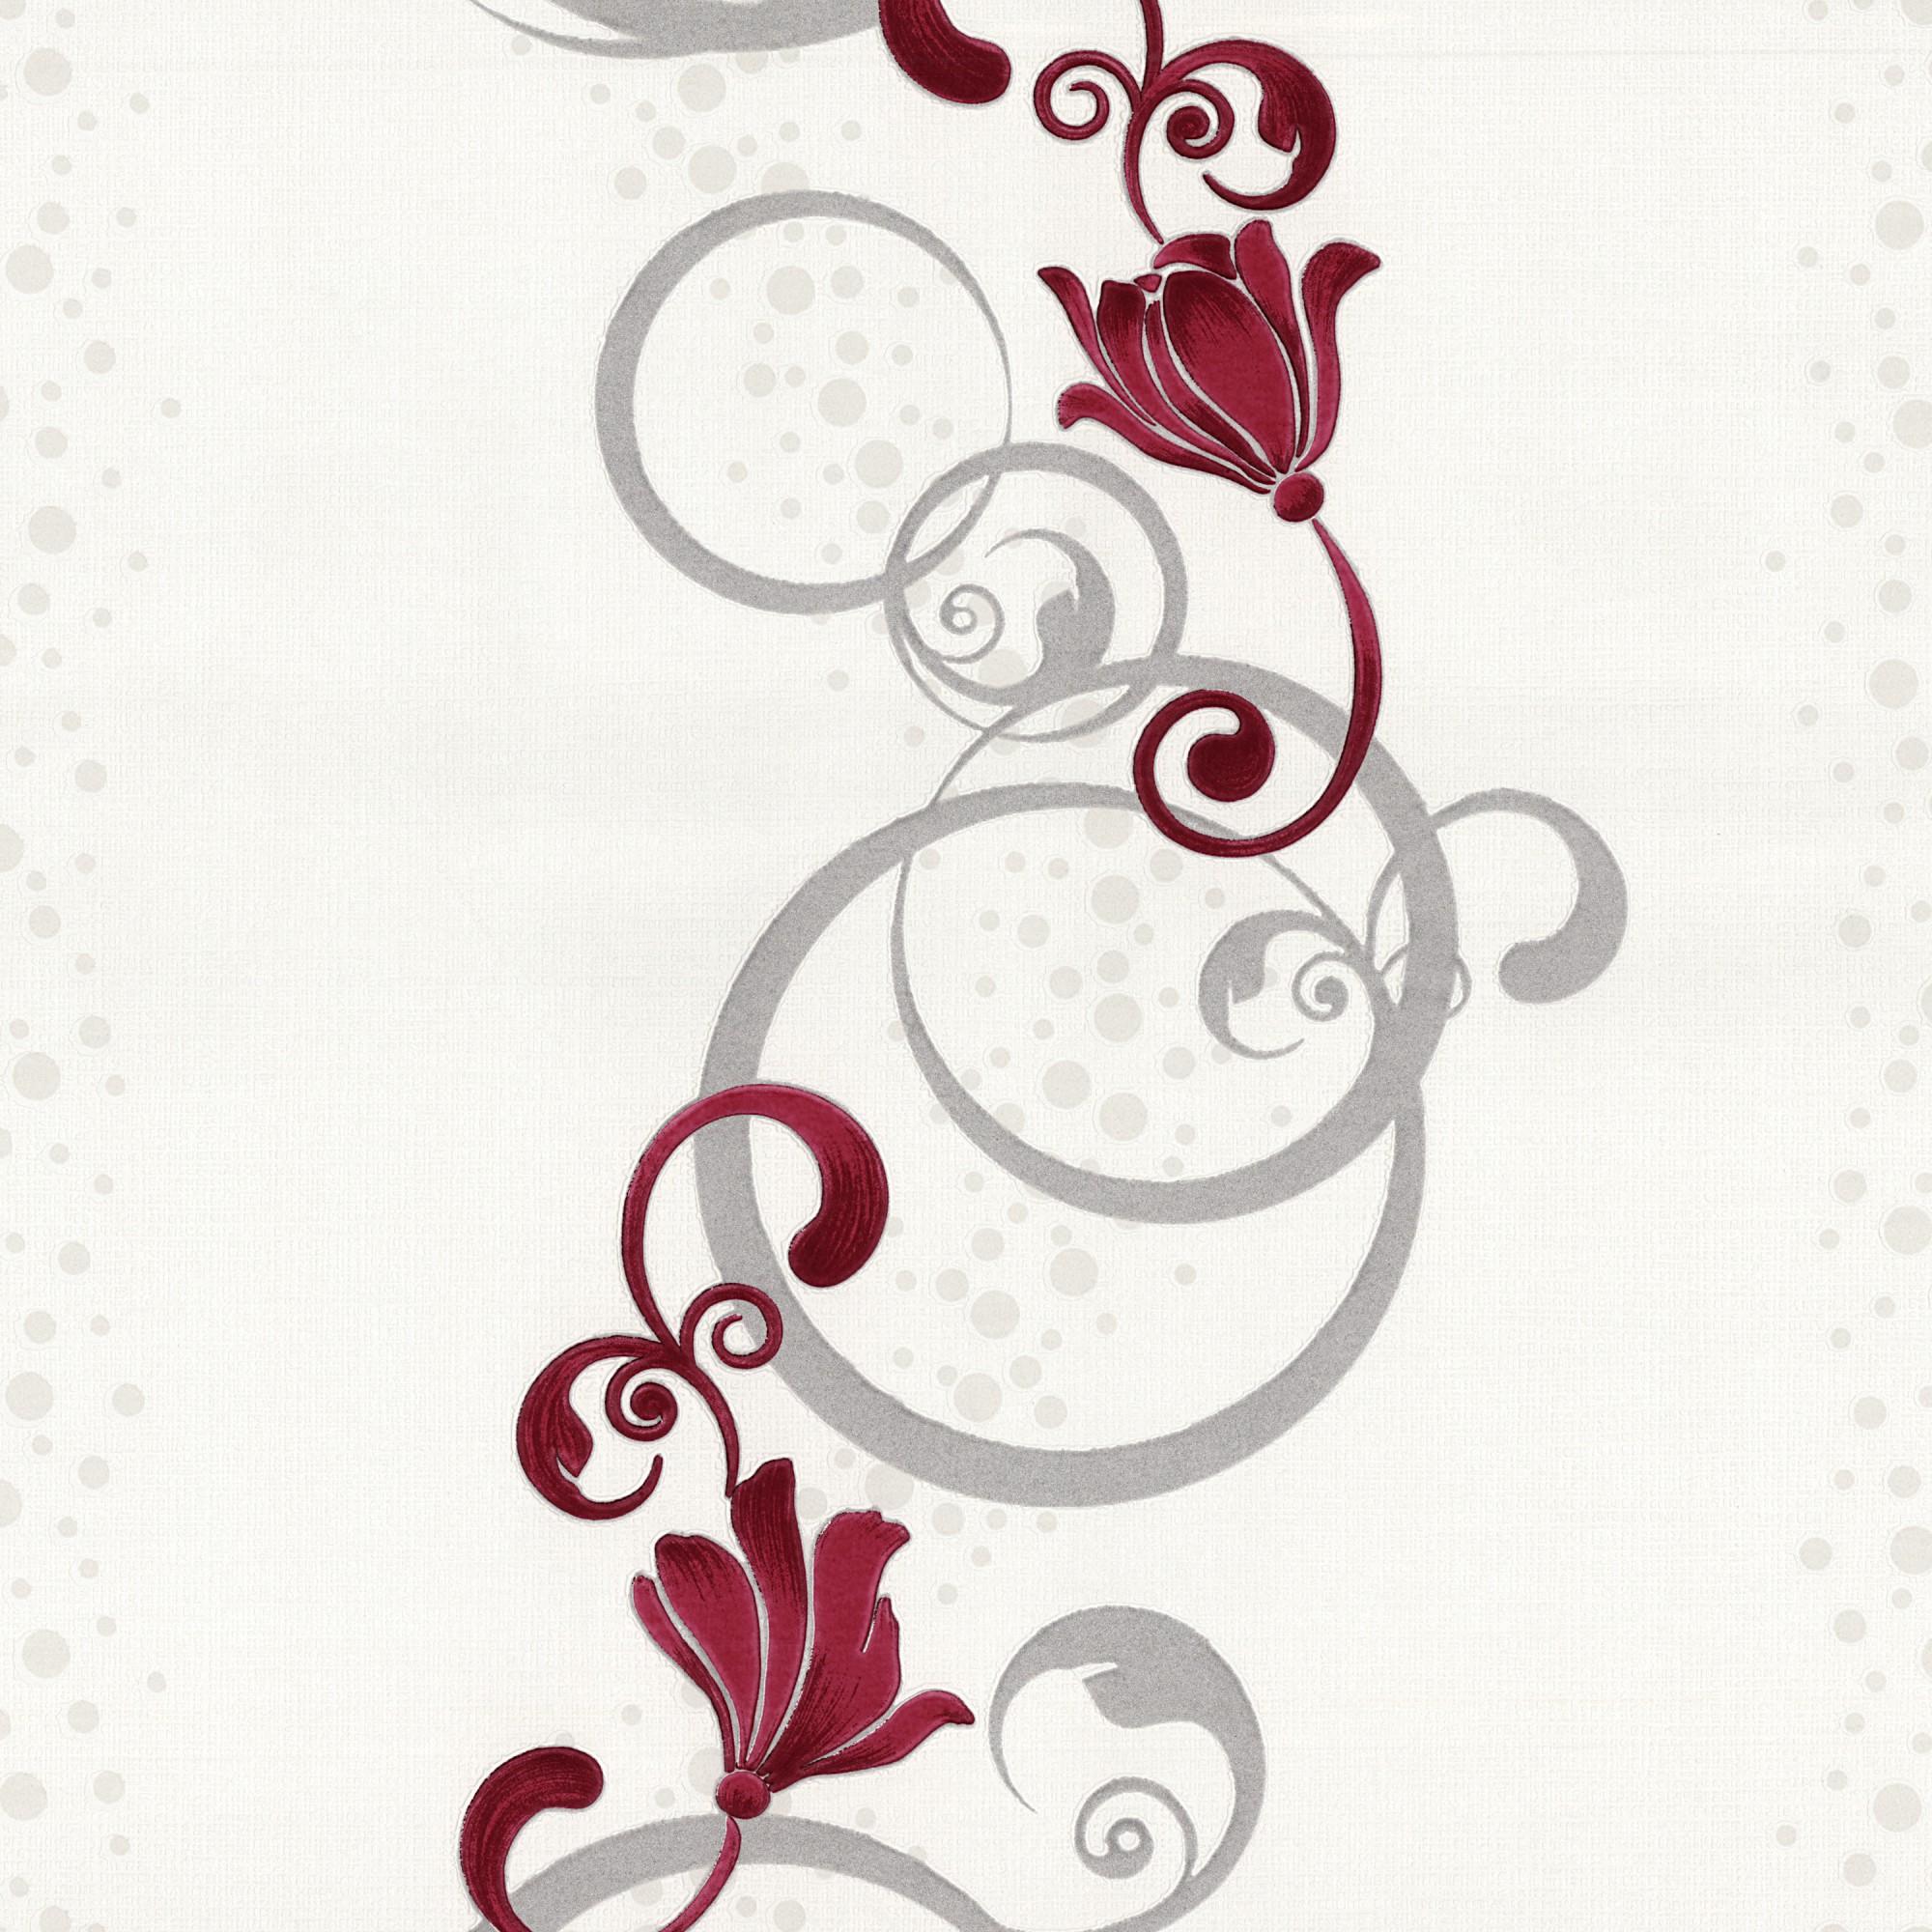 tapete blumen design rot grau vliestapete p s pure easy 13287 20 2 10 1qm ebay. Black Bedroom Furniture Sets. Home Design Ideas